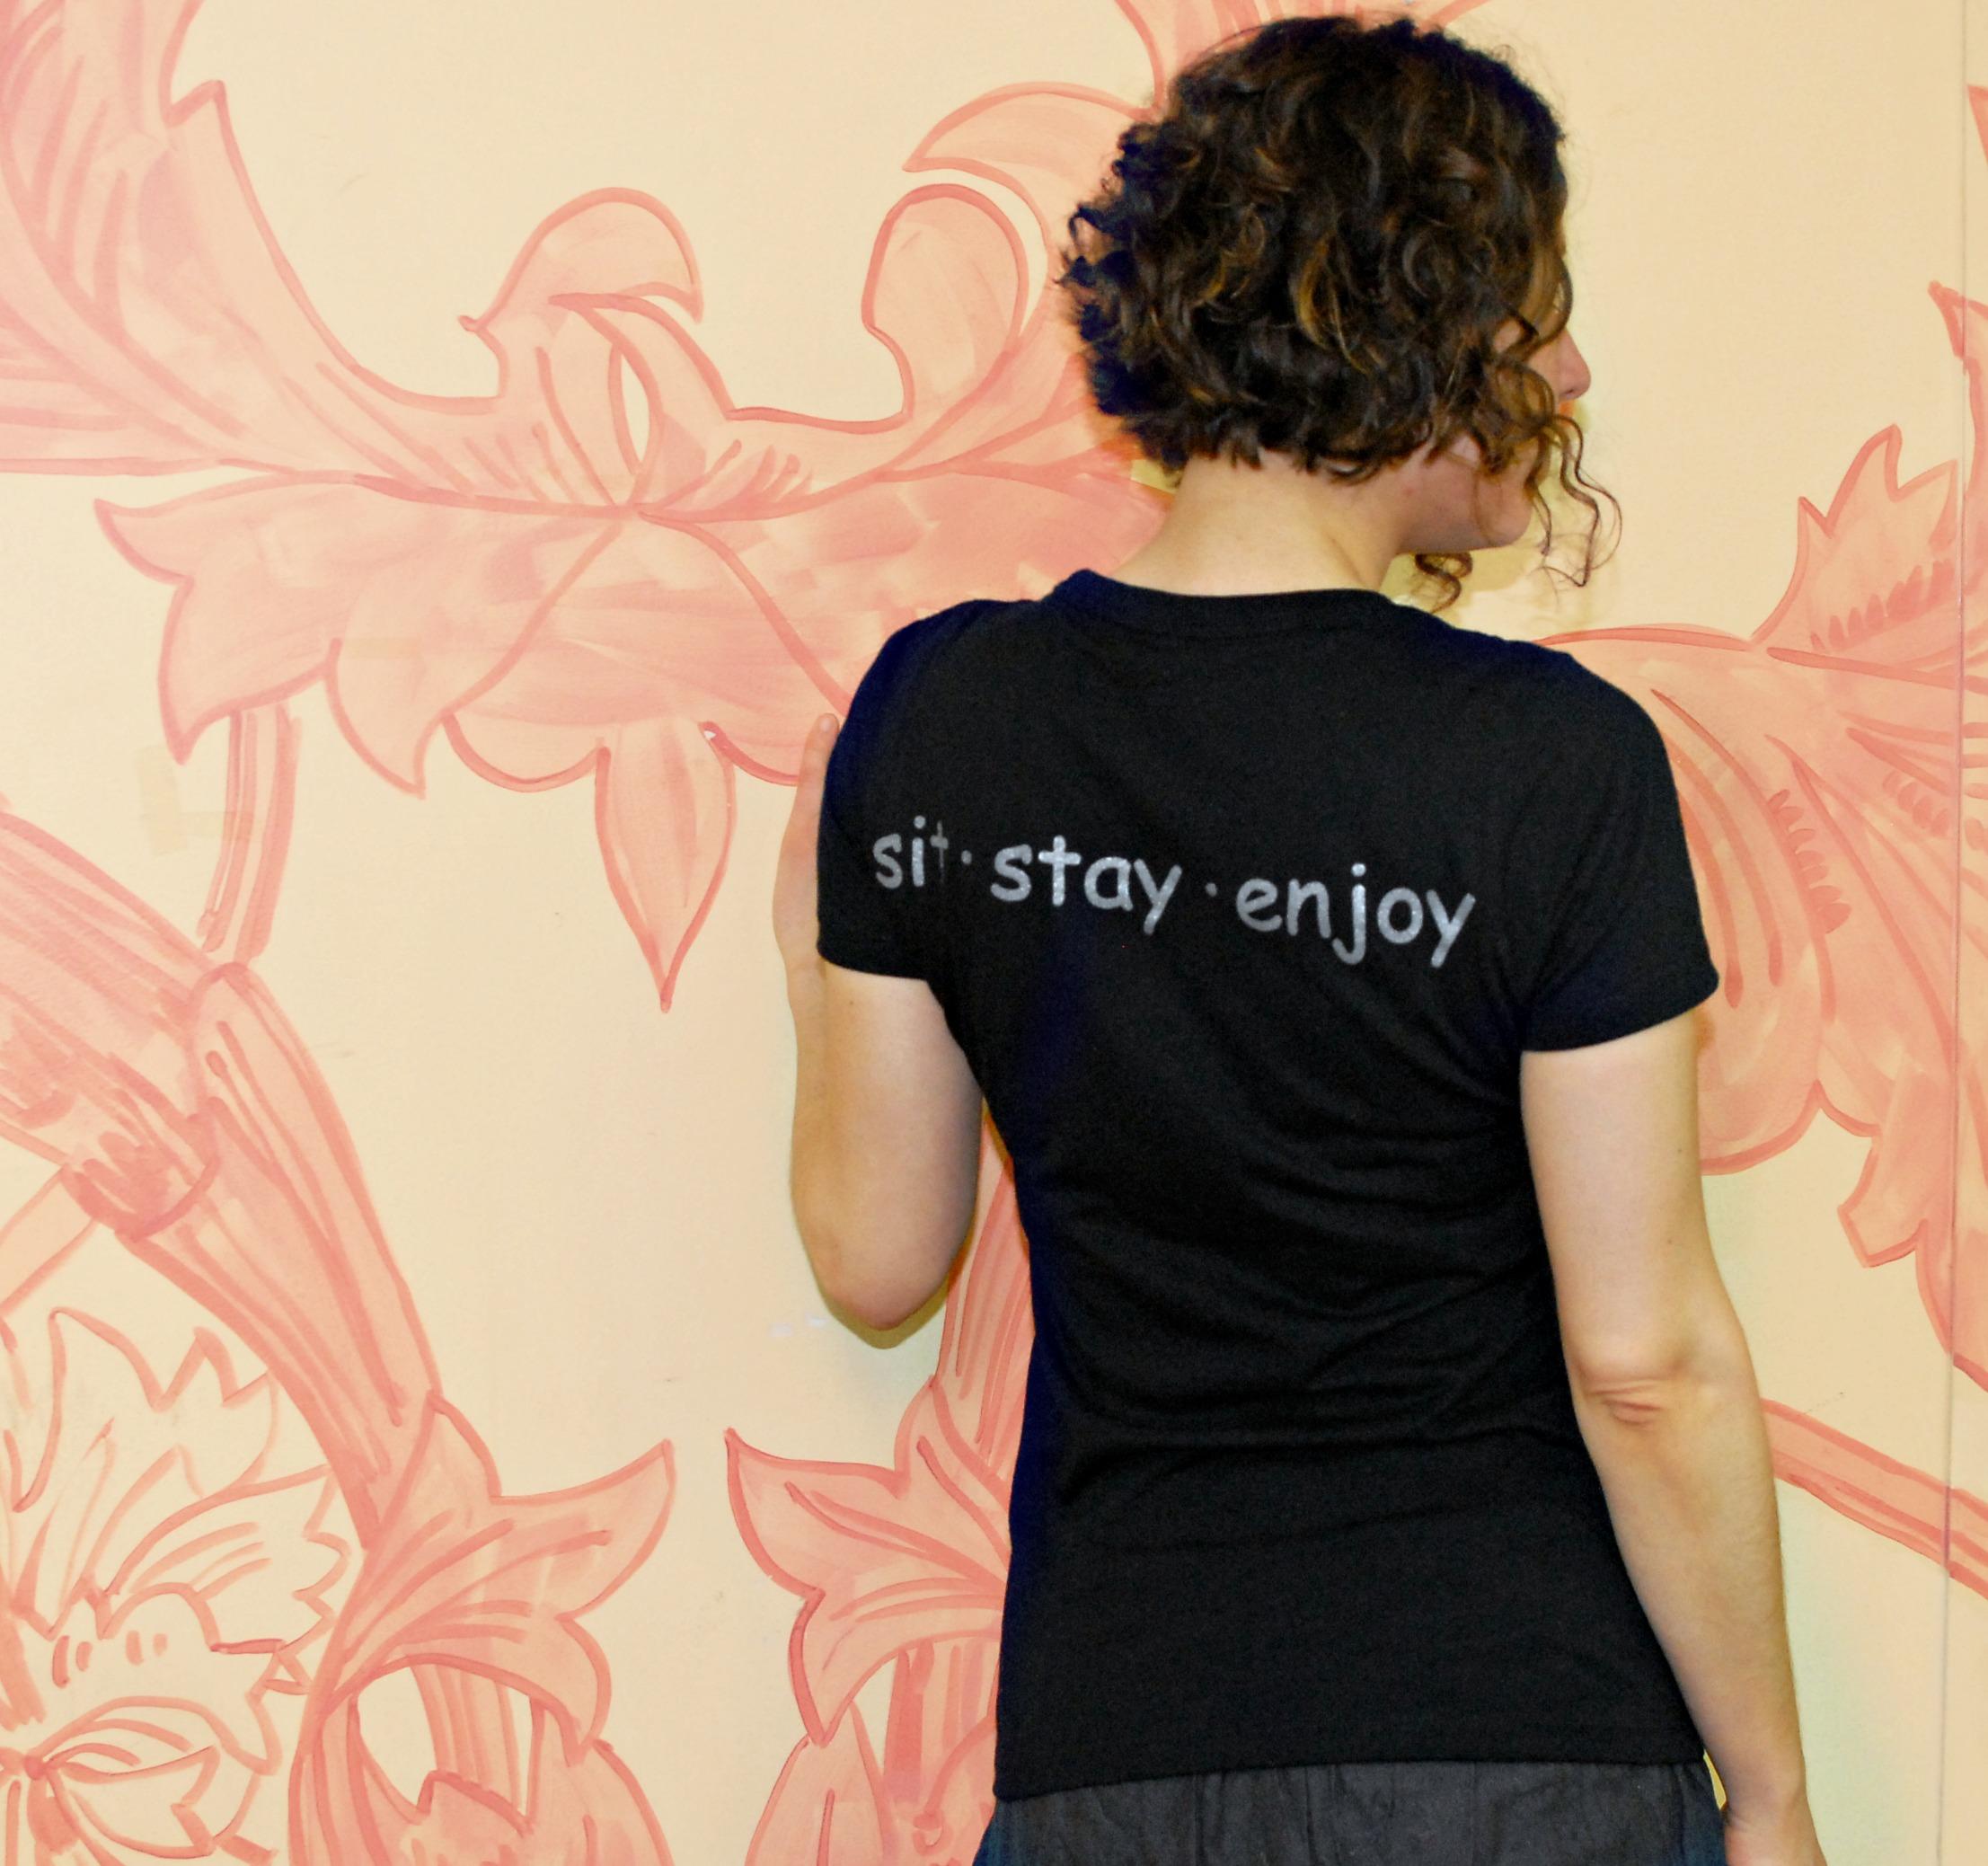 Anna t-shirt 4.jpg